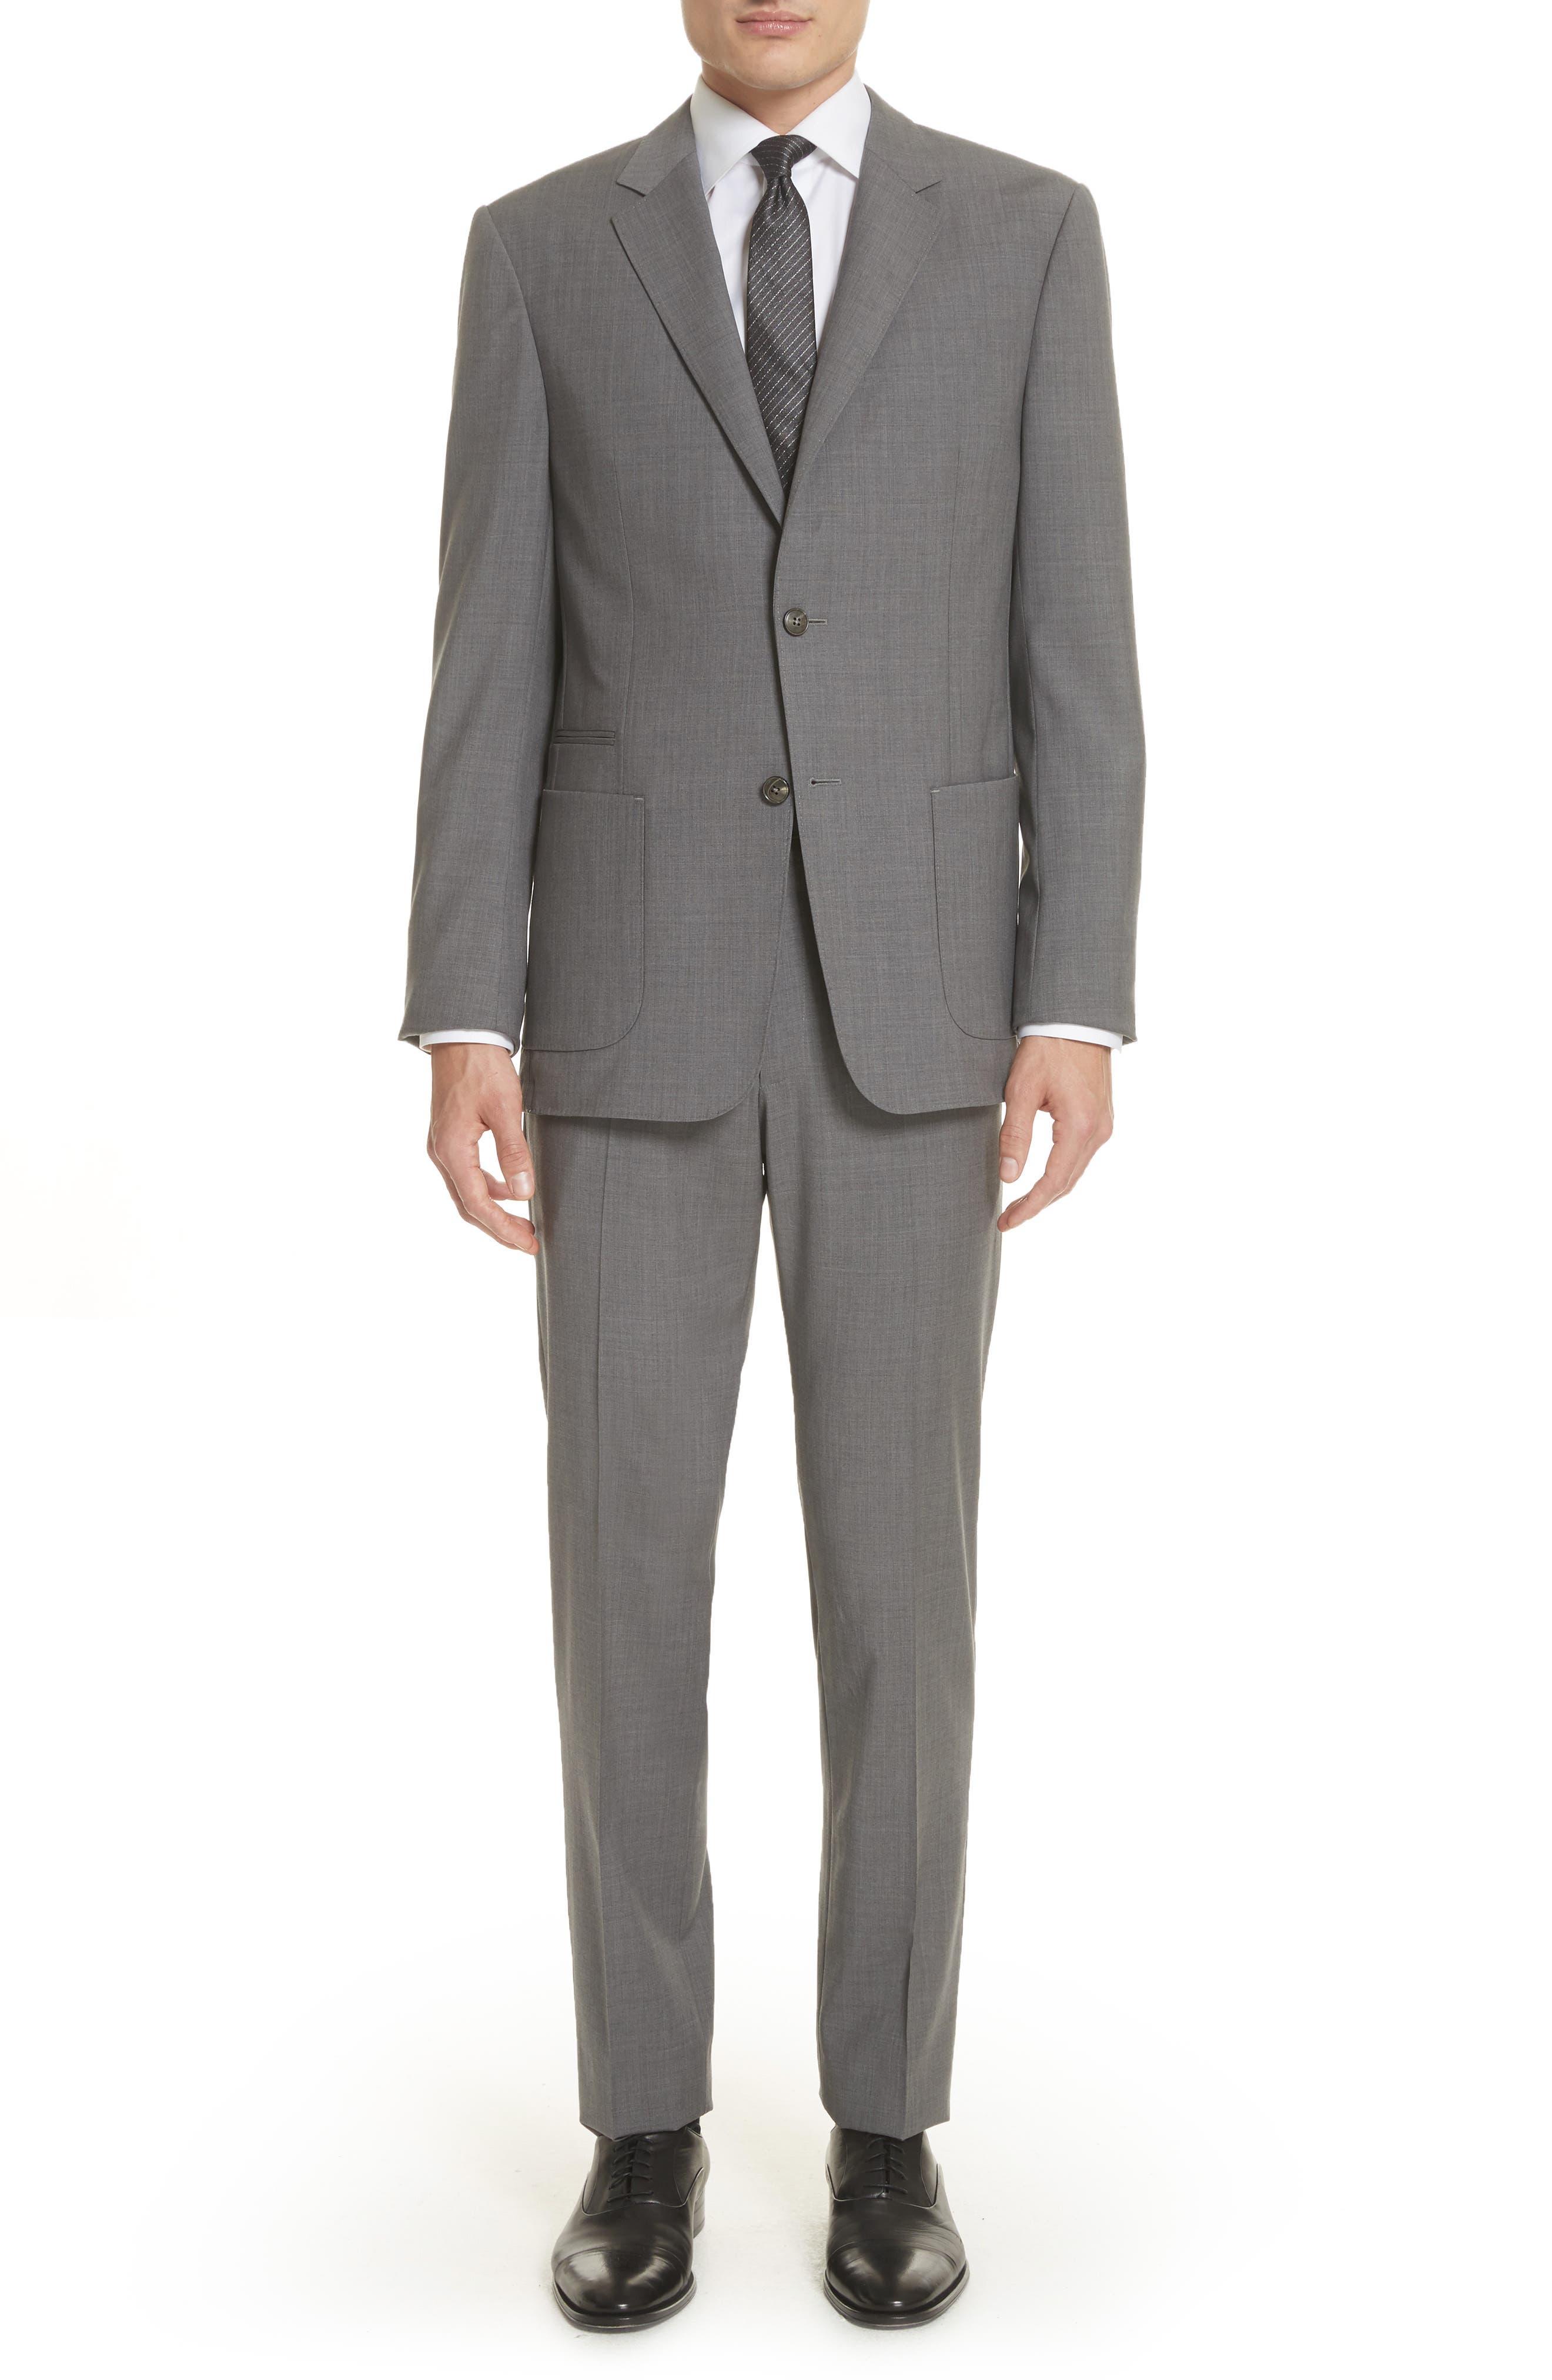 Z Zegna Techmerino Trim Fit Solid Wool Suit